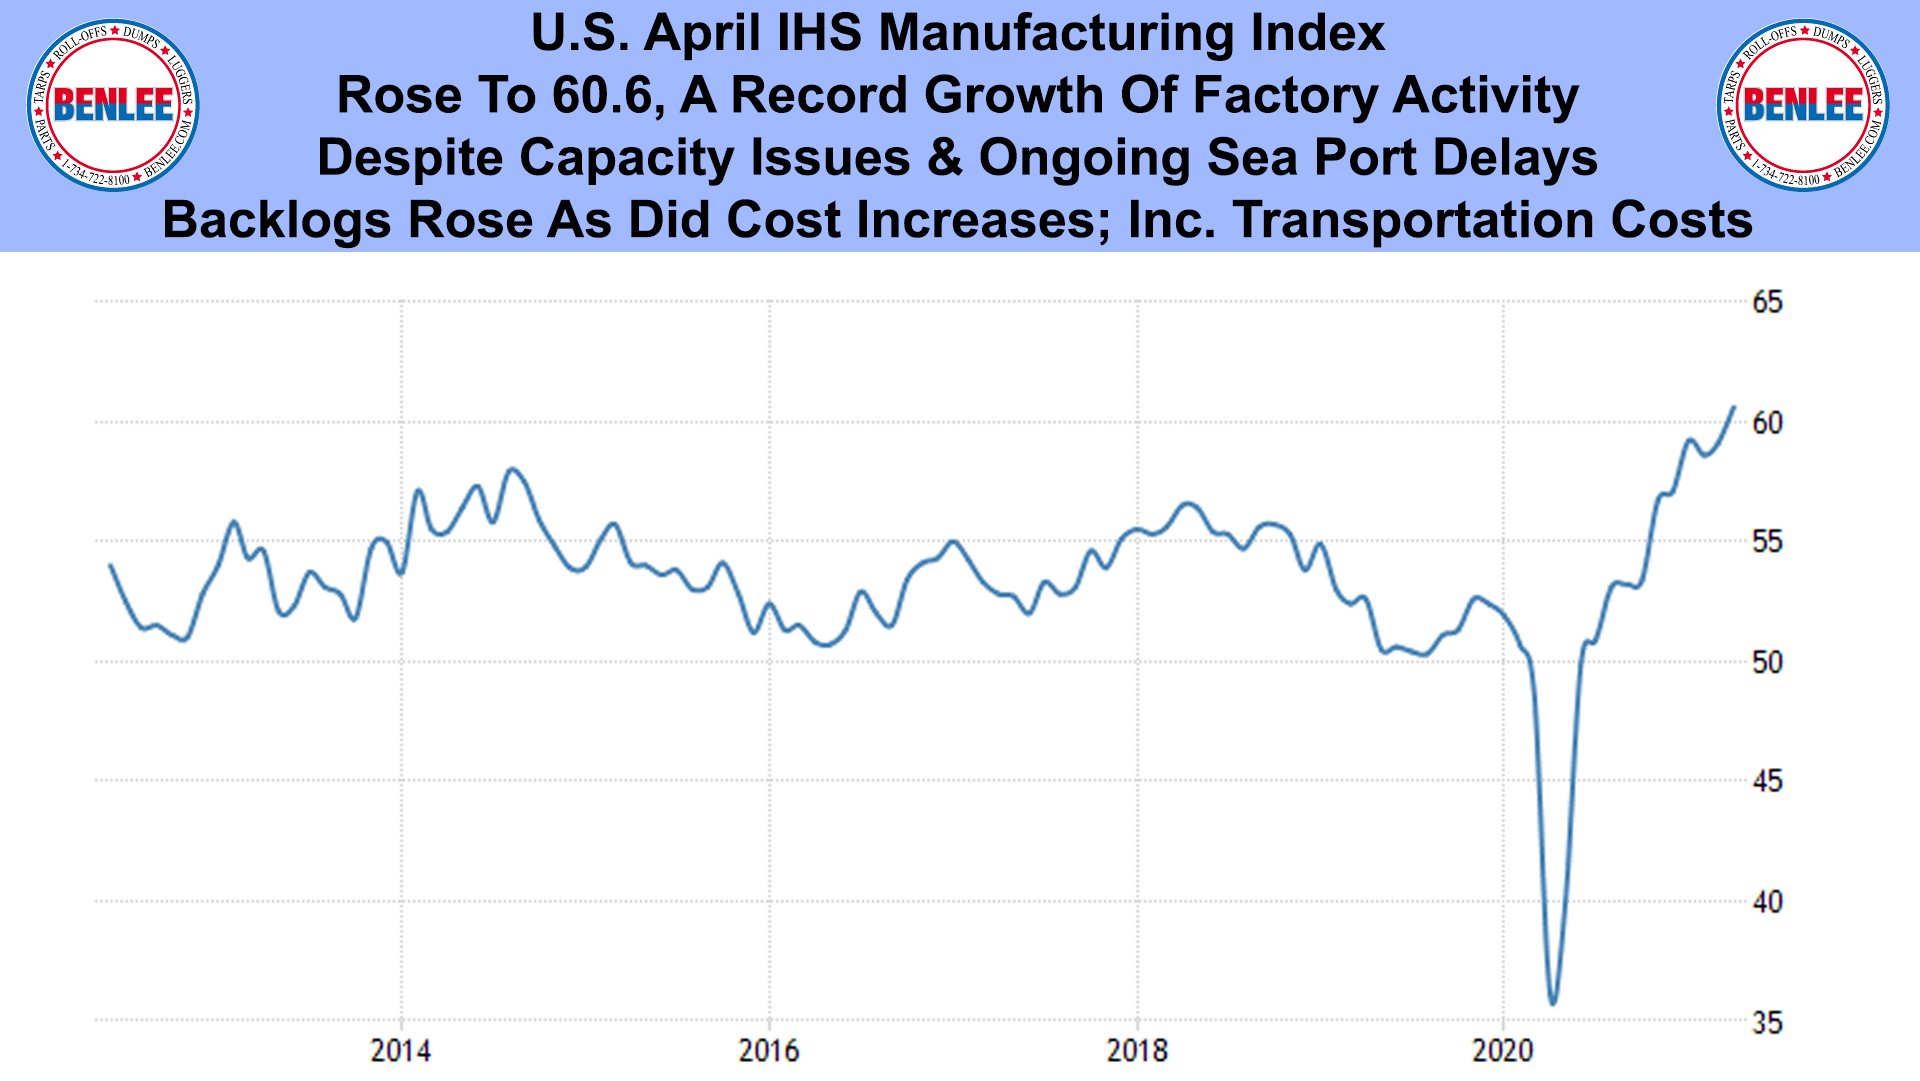 U.S. April IHS Manufacturing Index